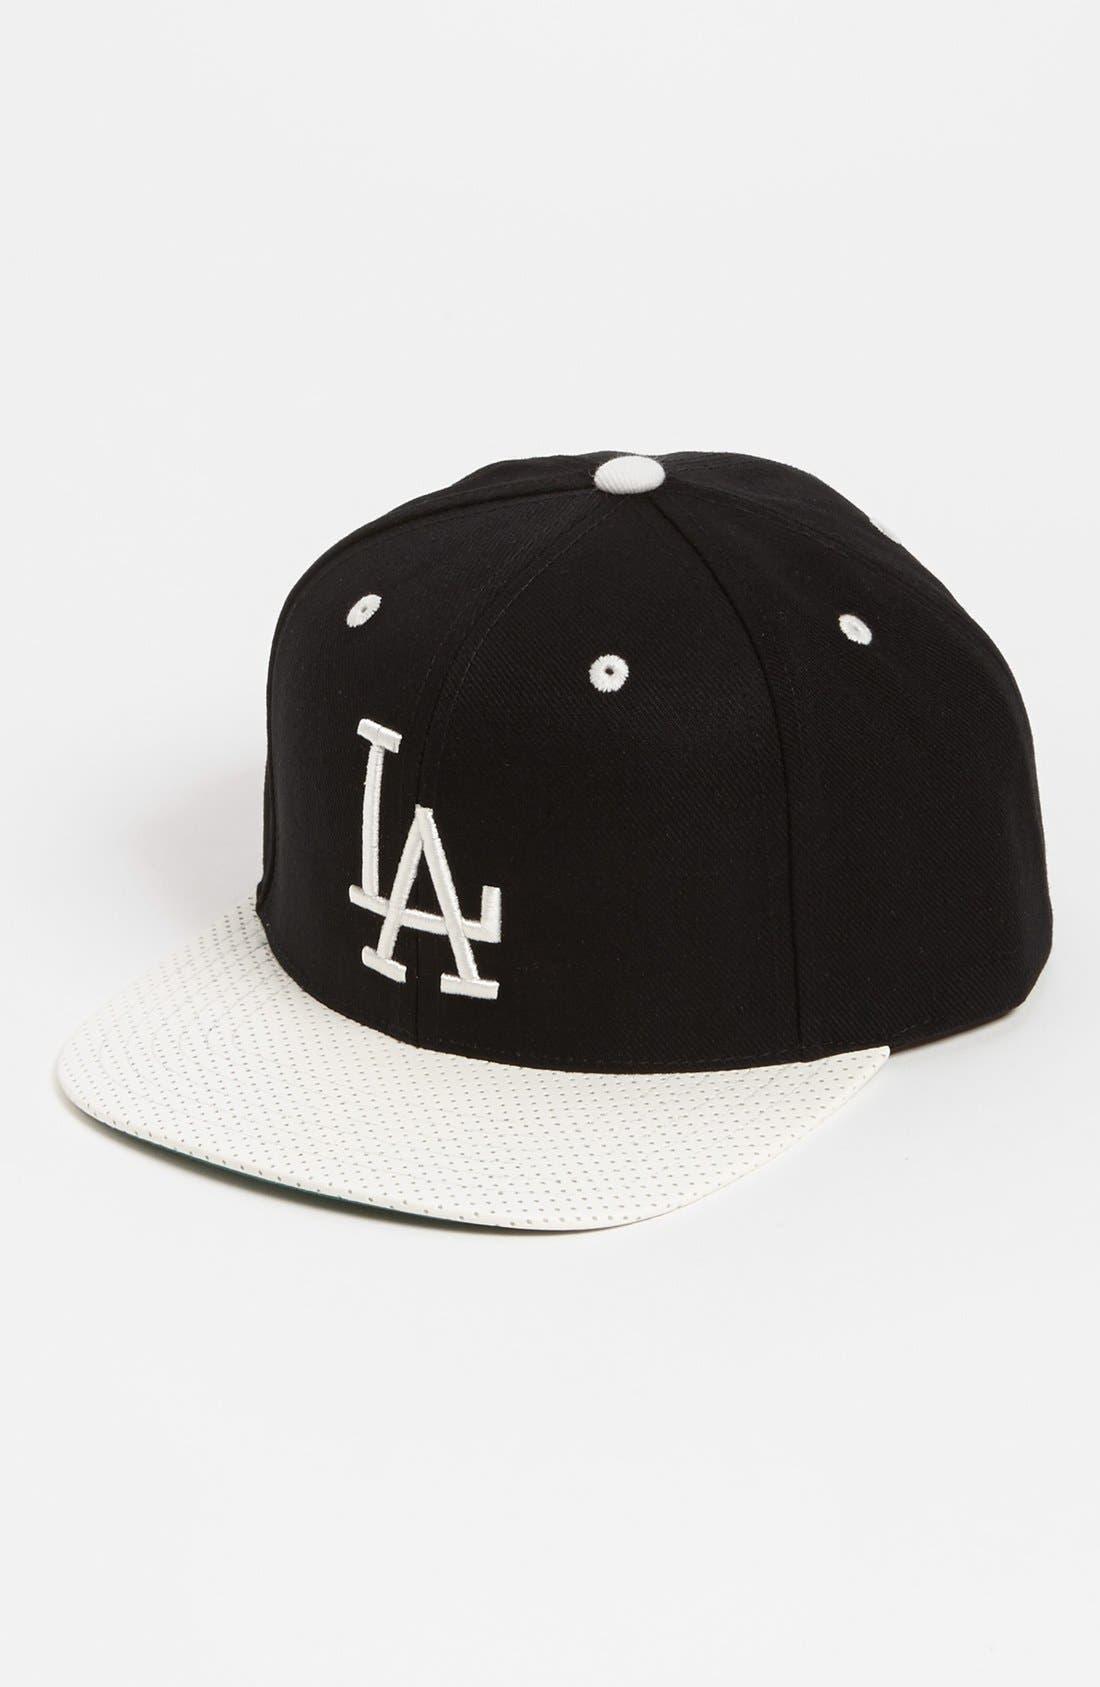 Alternate Image 1 Selected - American Needle 'Los Angeles Dodgers - The Natural' Snapback Baseball Cap